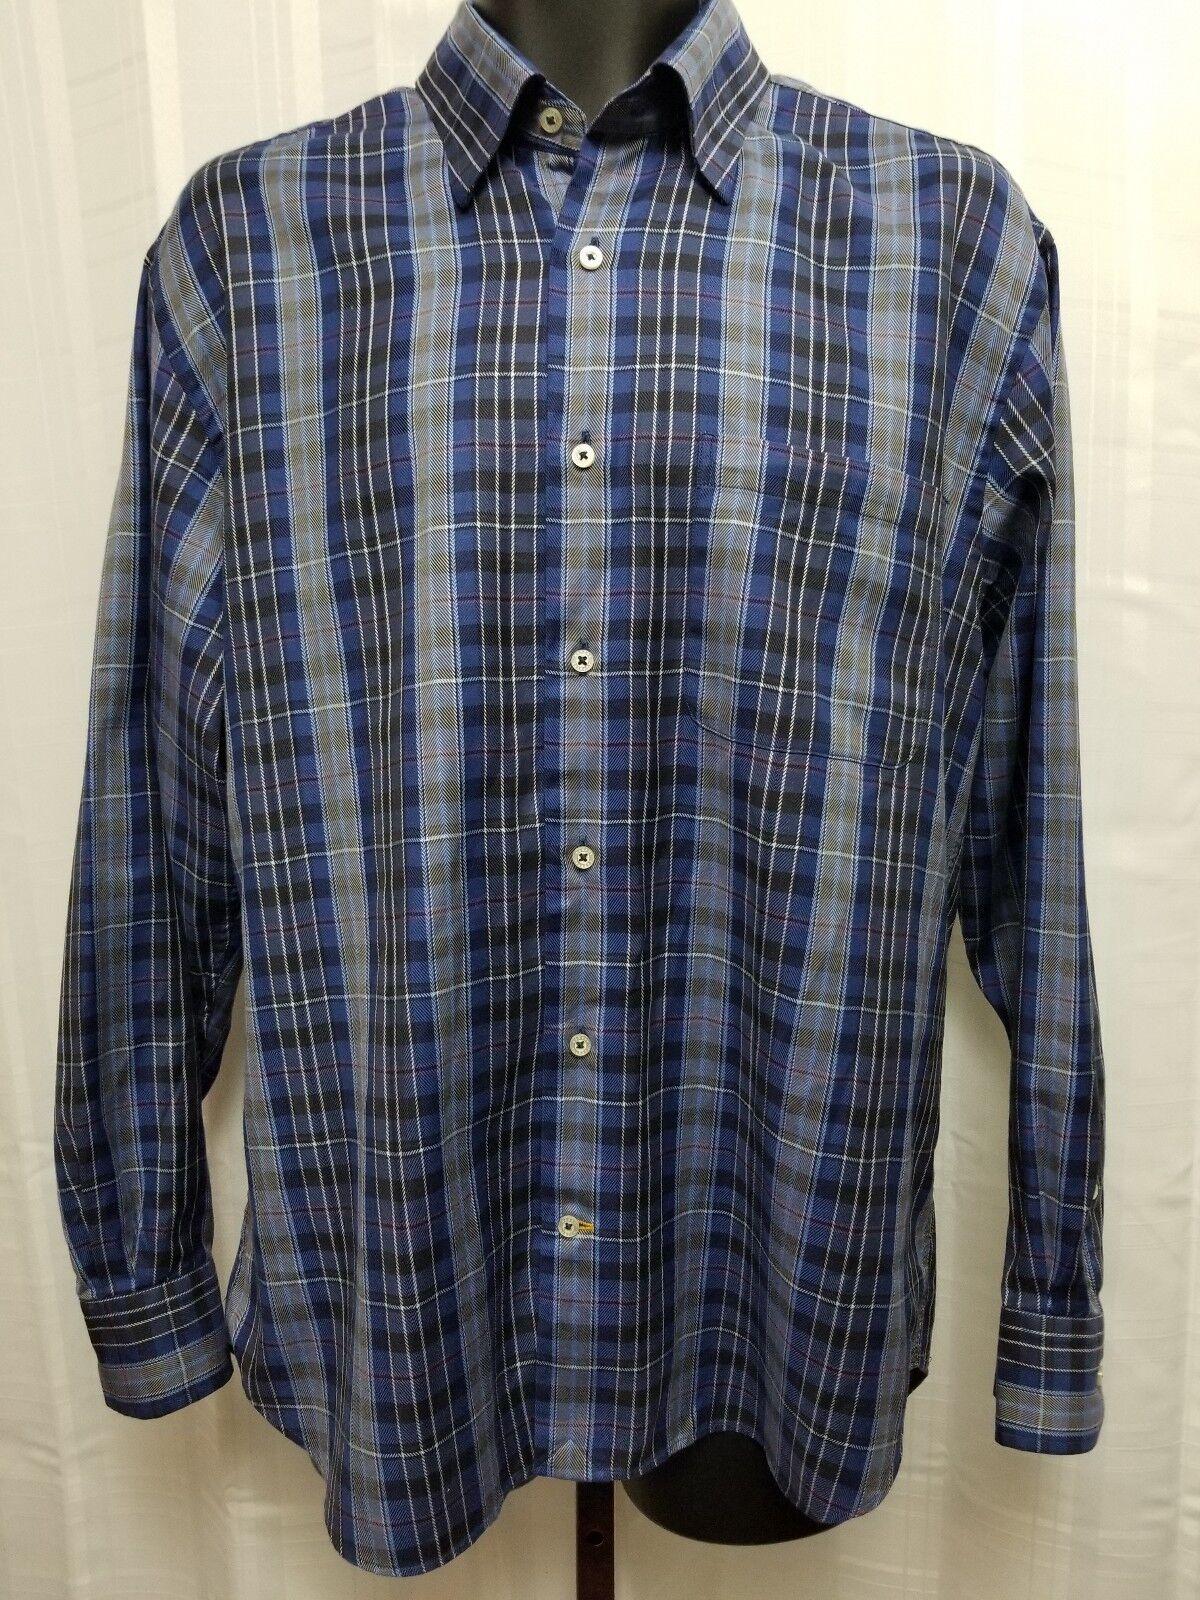 Robert Talbott Carmel bluee Plaid 100% COTTON Dress Casual Shirt Large EUC